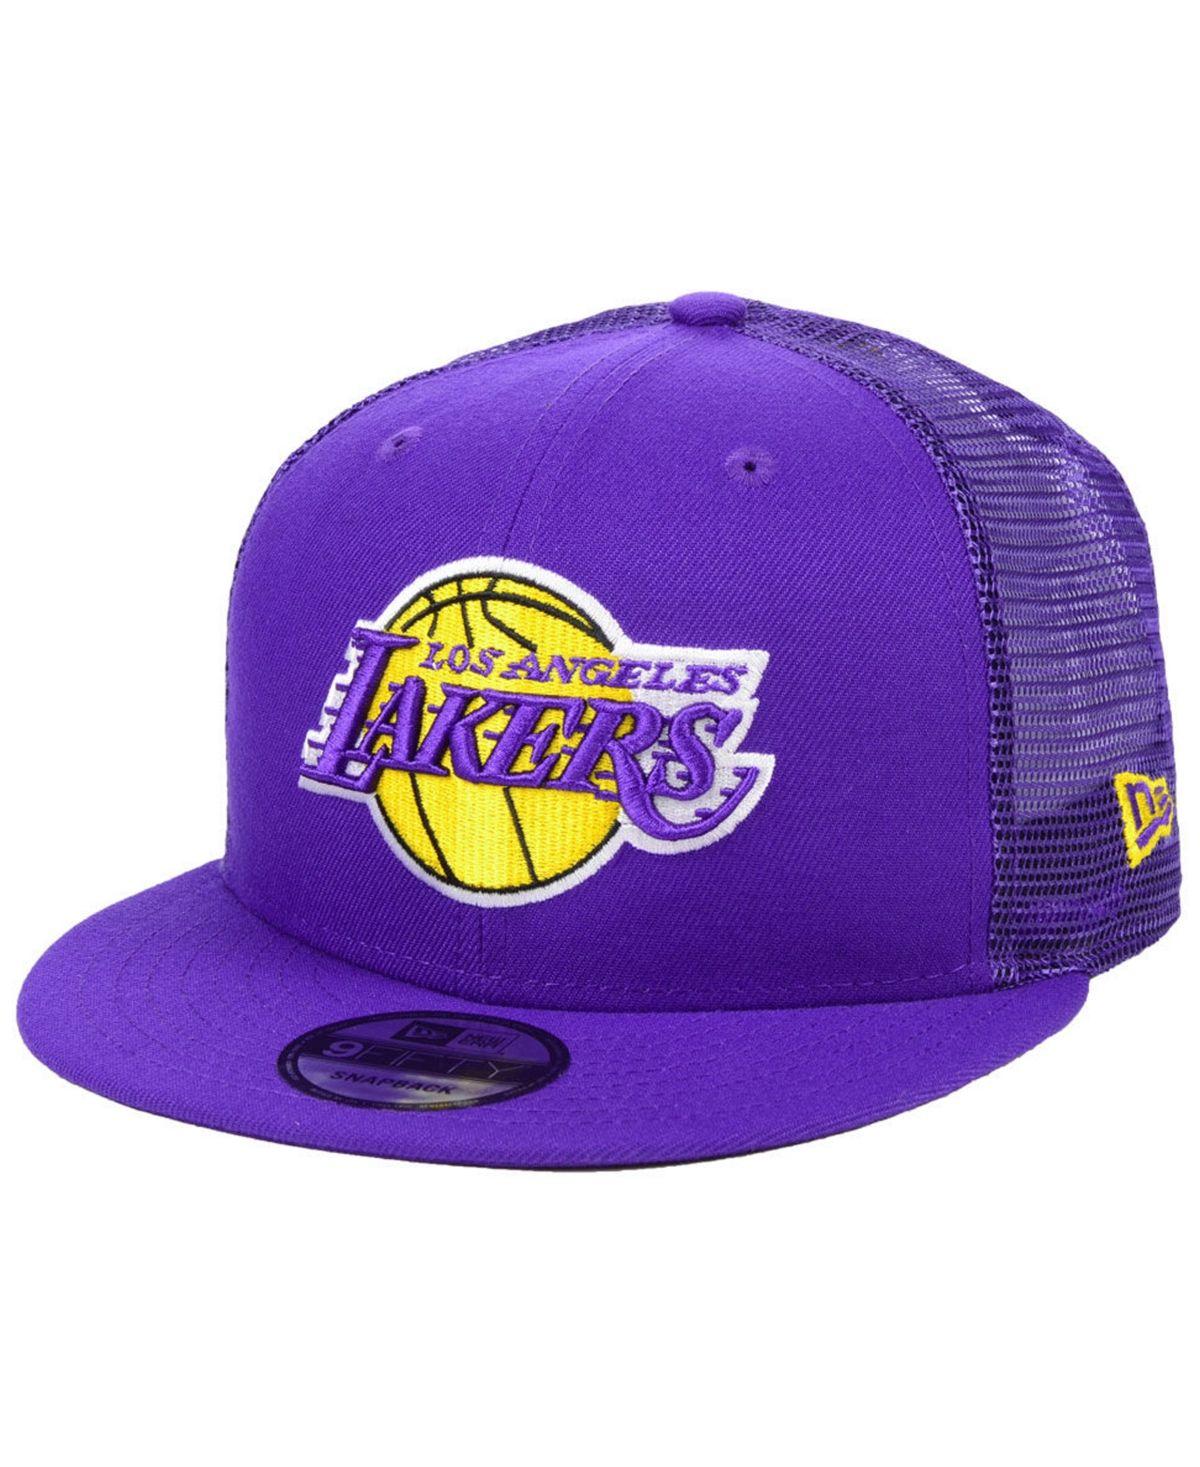 New Era Los Angeles Lakers Nothing But Net 9fifty Snapback Cap Purple Snapback Cap Los Angeles Lakers New Era